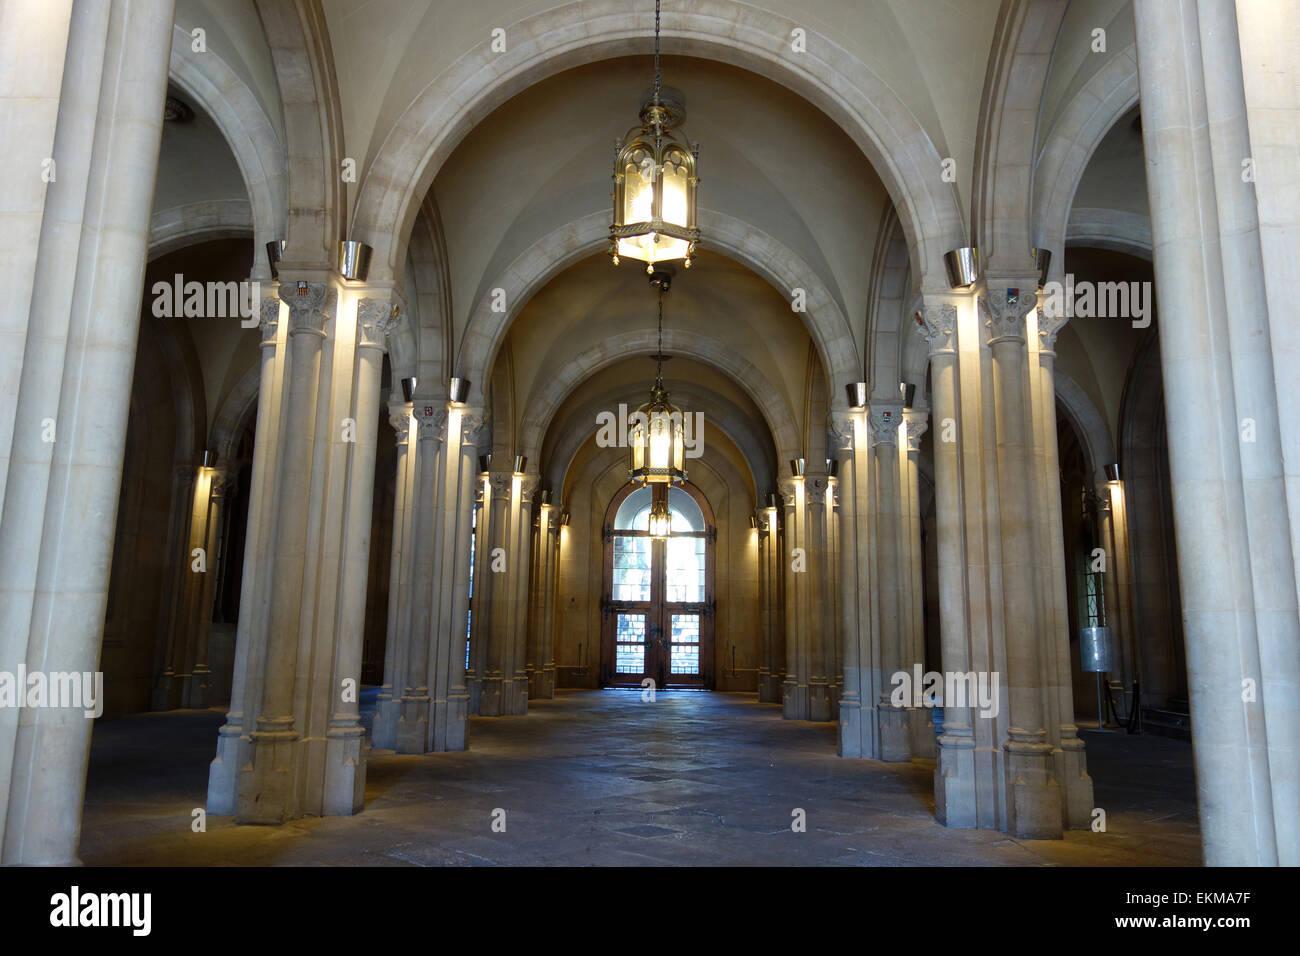 Interior entrance hall of old University of Barcelona, Plaza Universitat, Barcelona, Catalonia, Spain - Stock Image